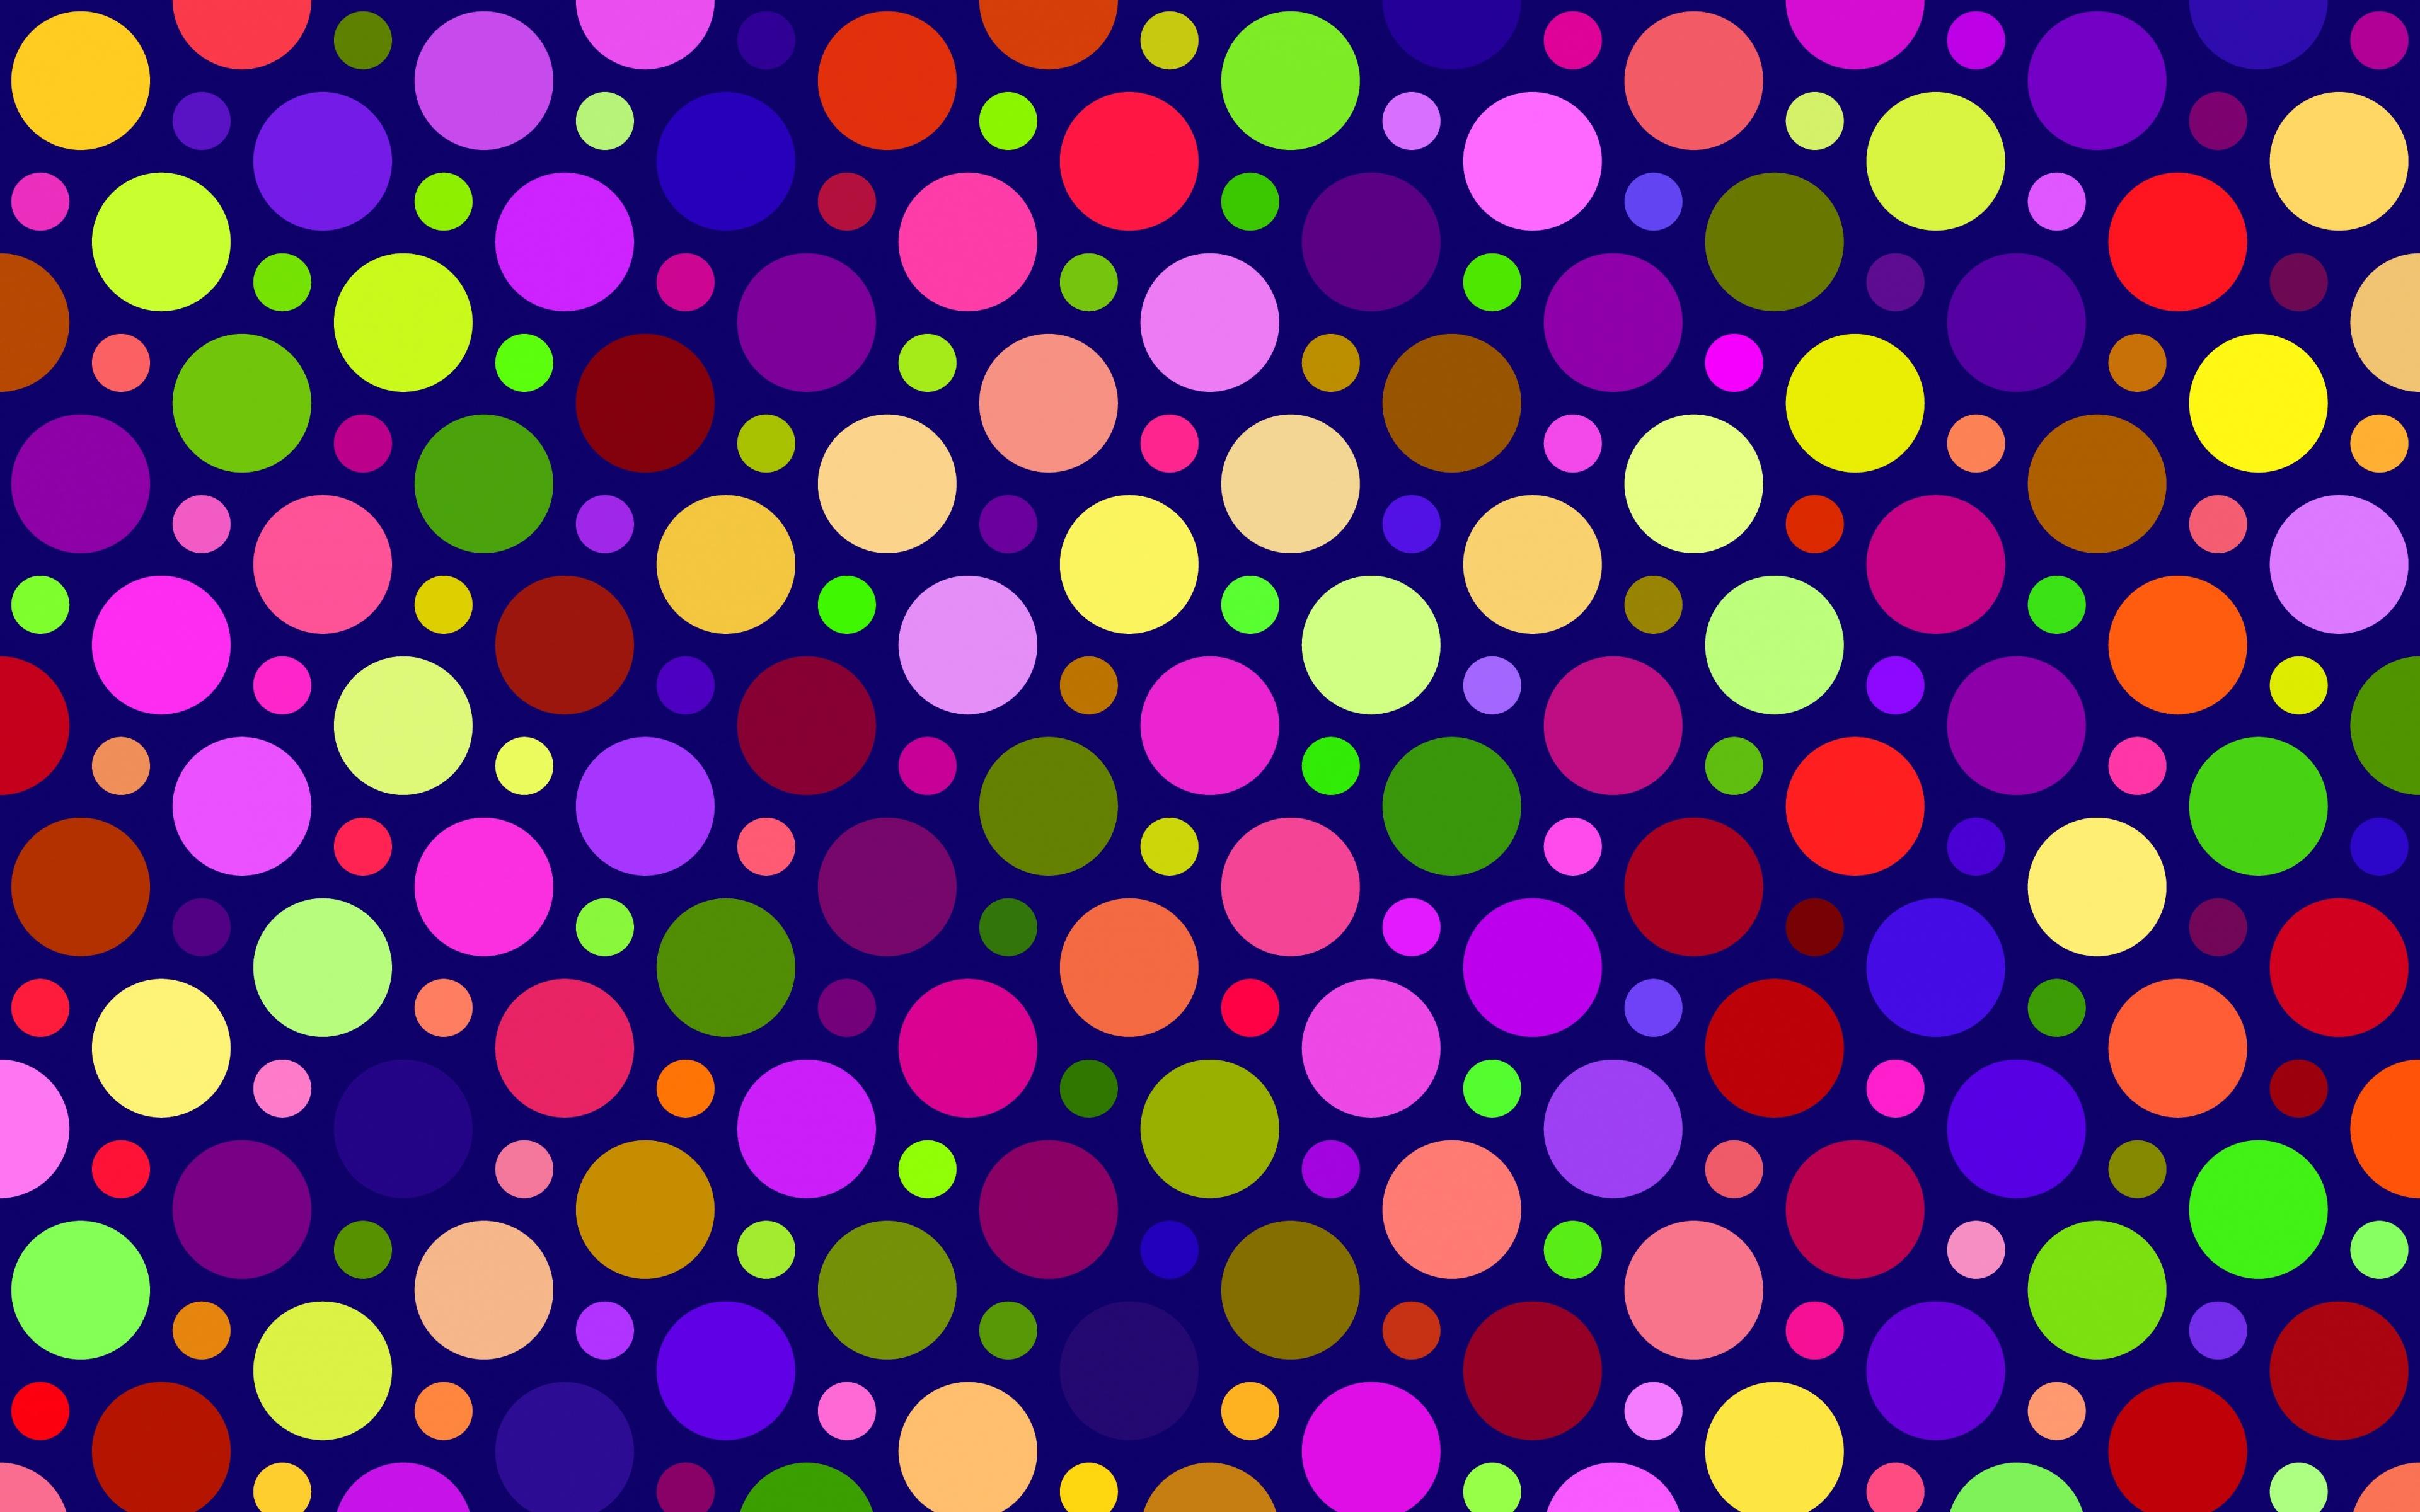 Color Circles Pattern Wallpaper 4K HD Download Of Colorful Circles